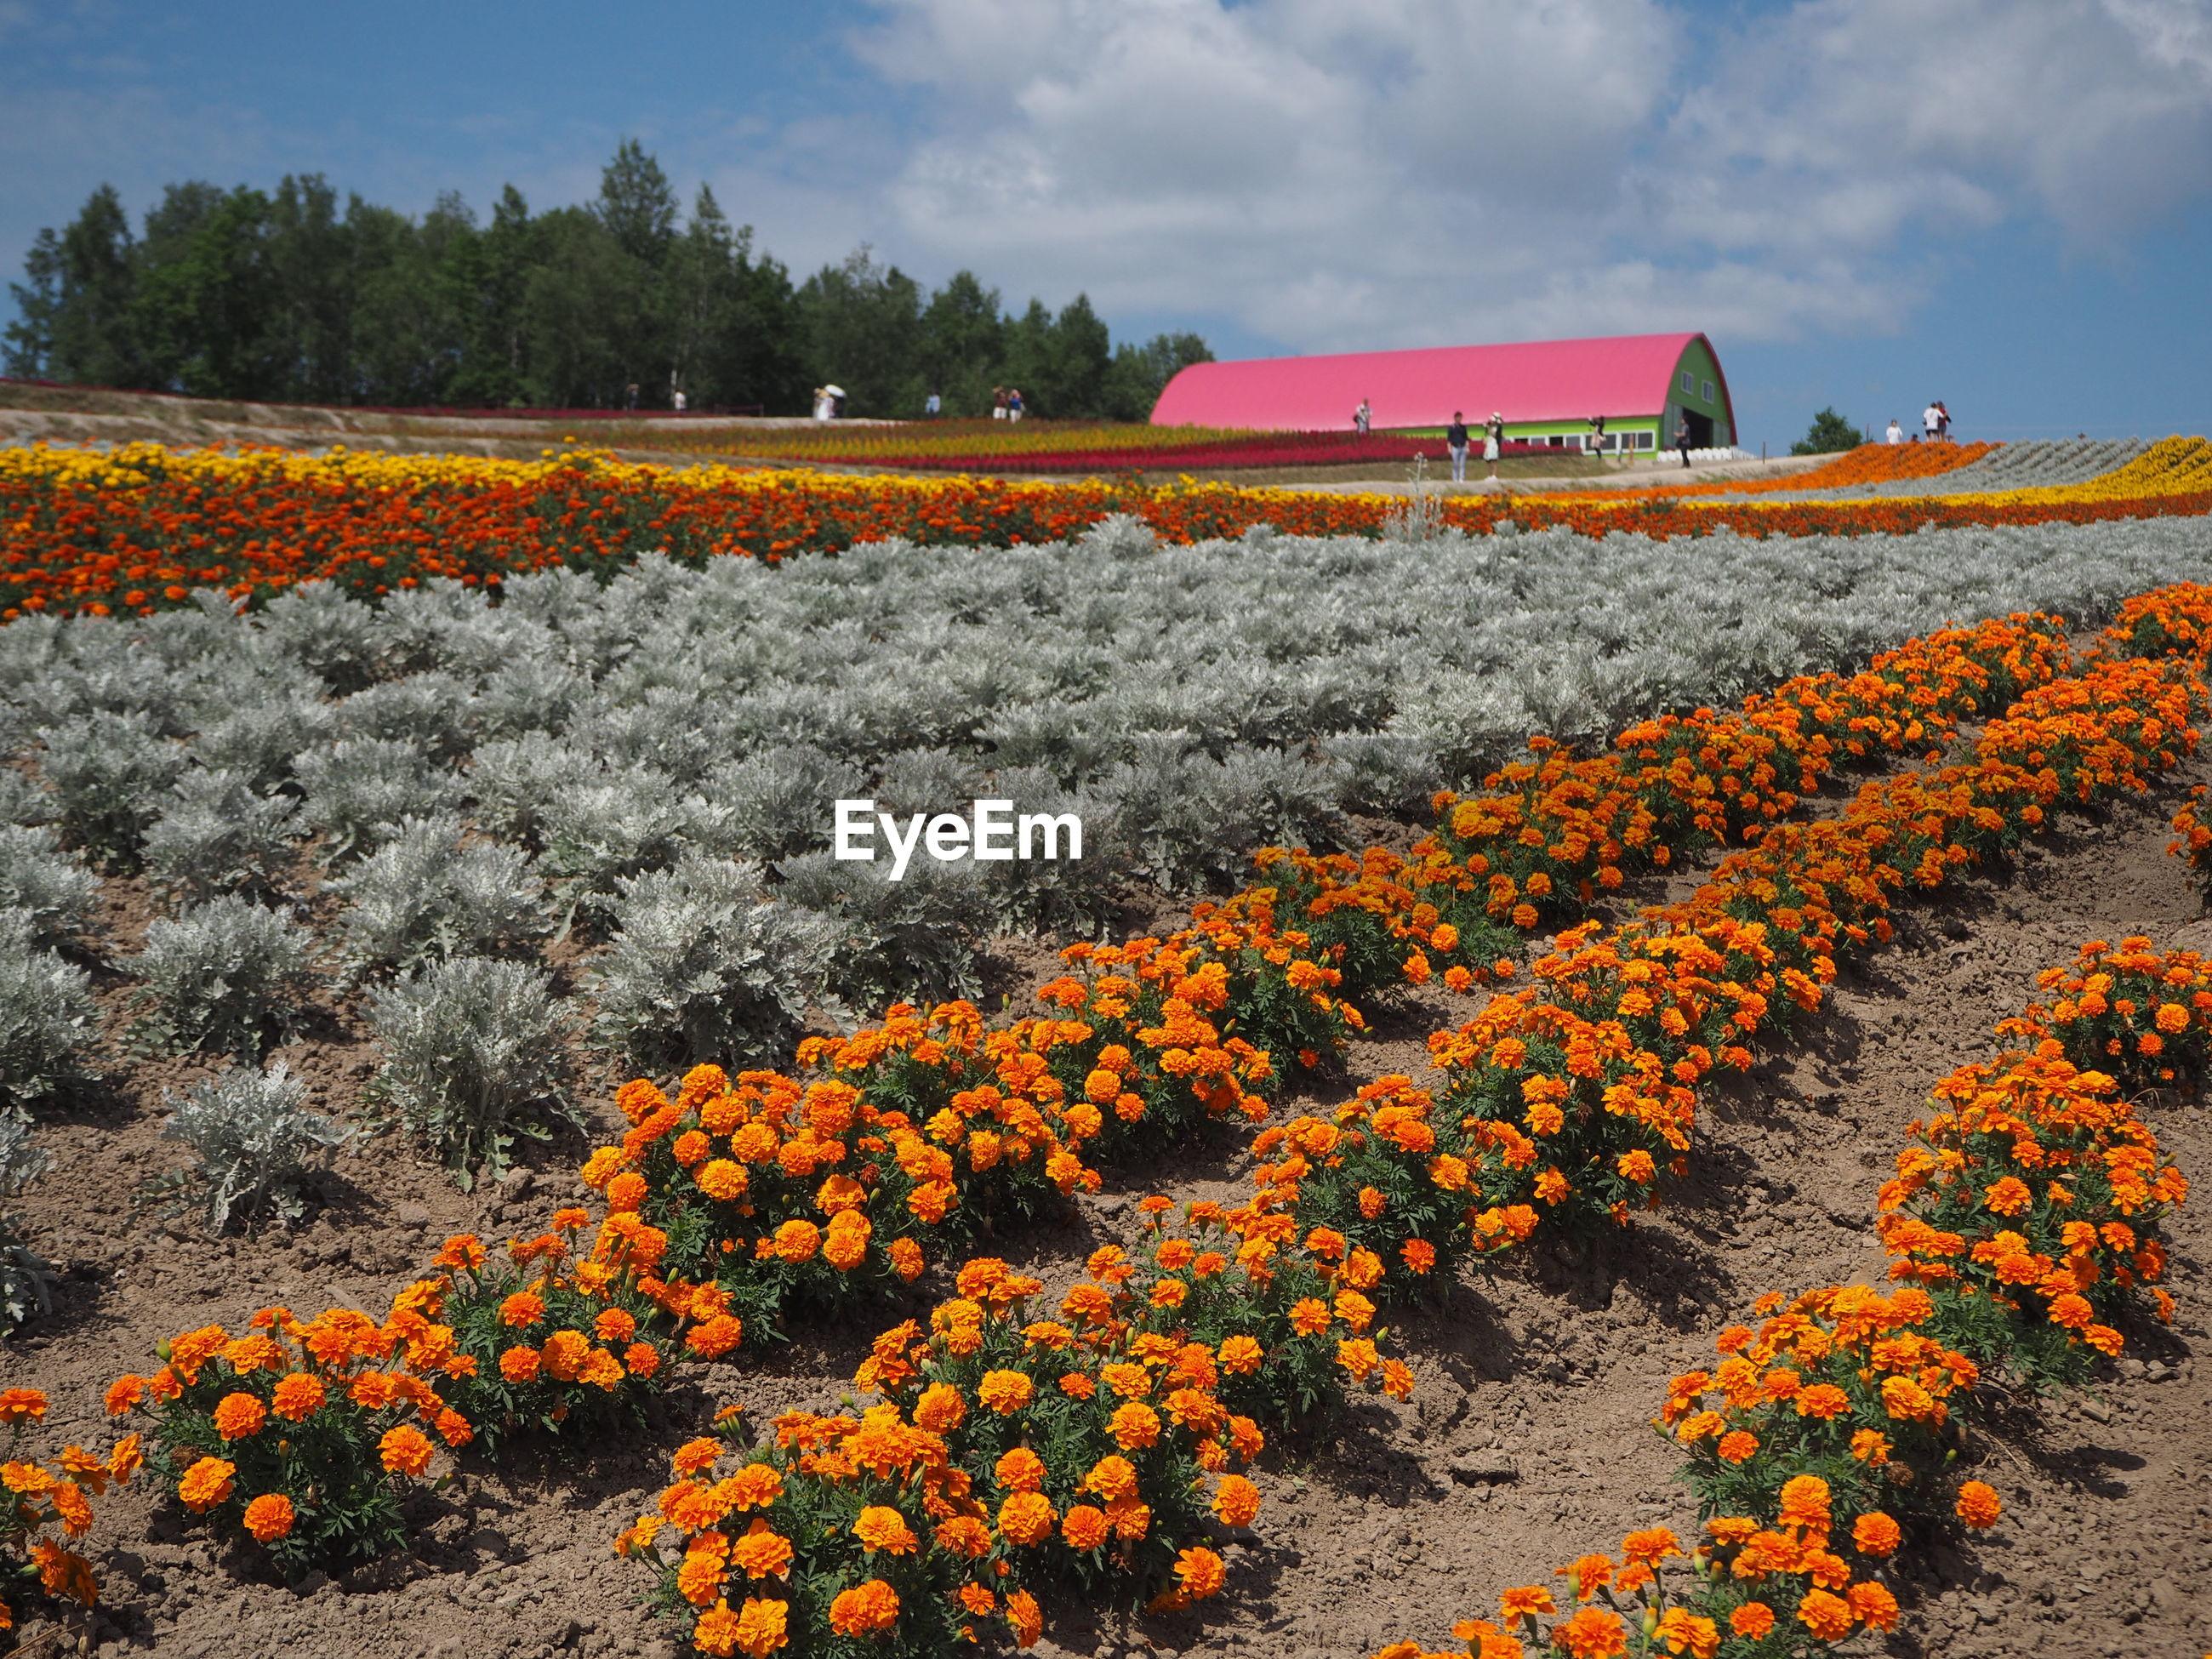 Scenic view of flowering plants on field against orange sky